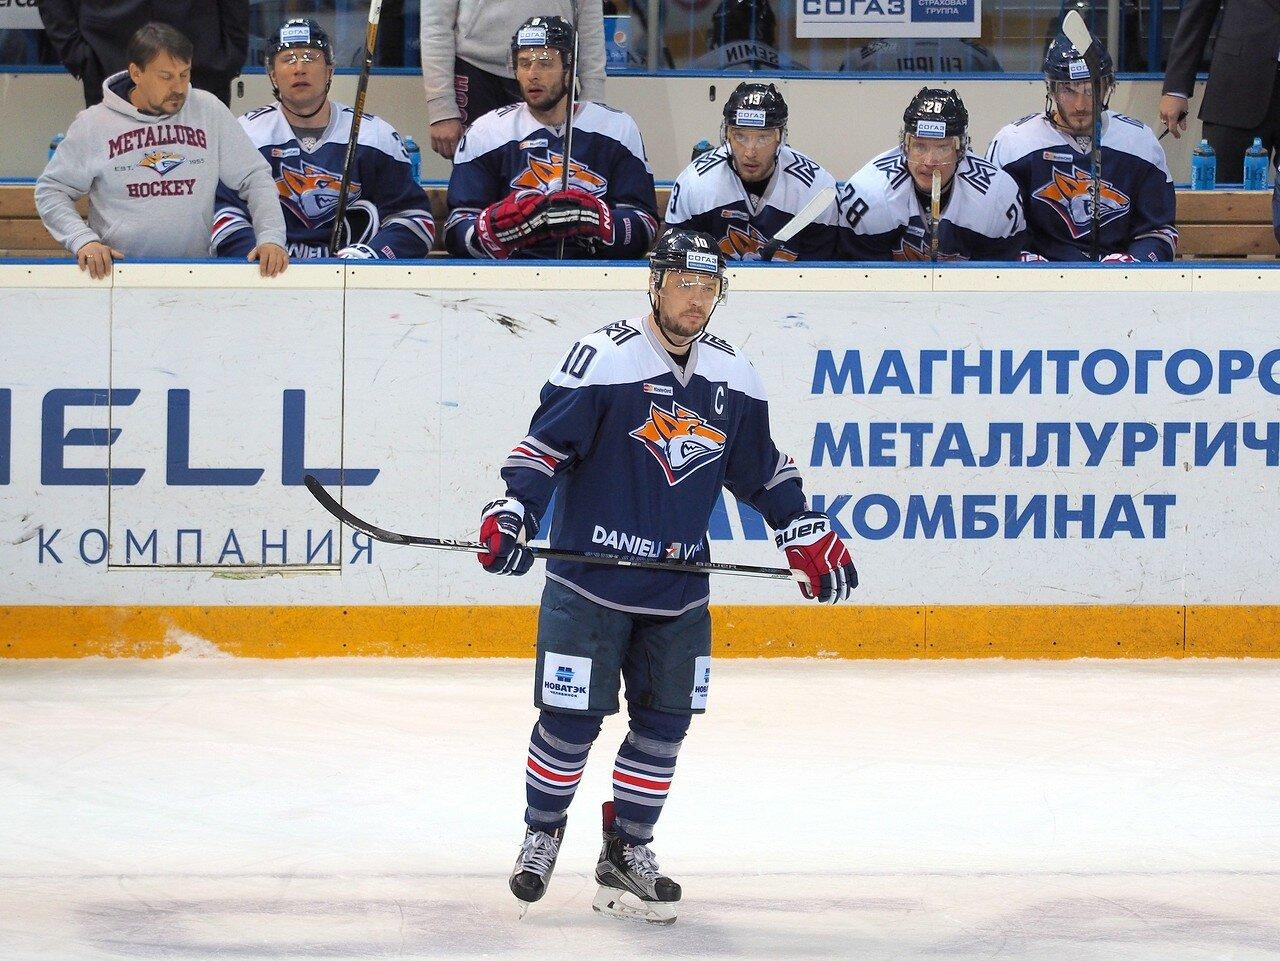 55Плей-офф 2016 Восток 1/2 Металлург - Сибирь 16.03.2016